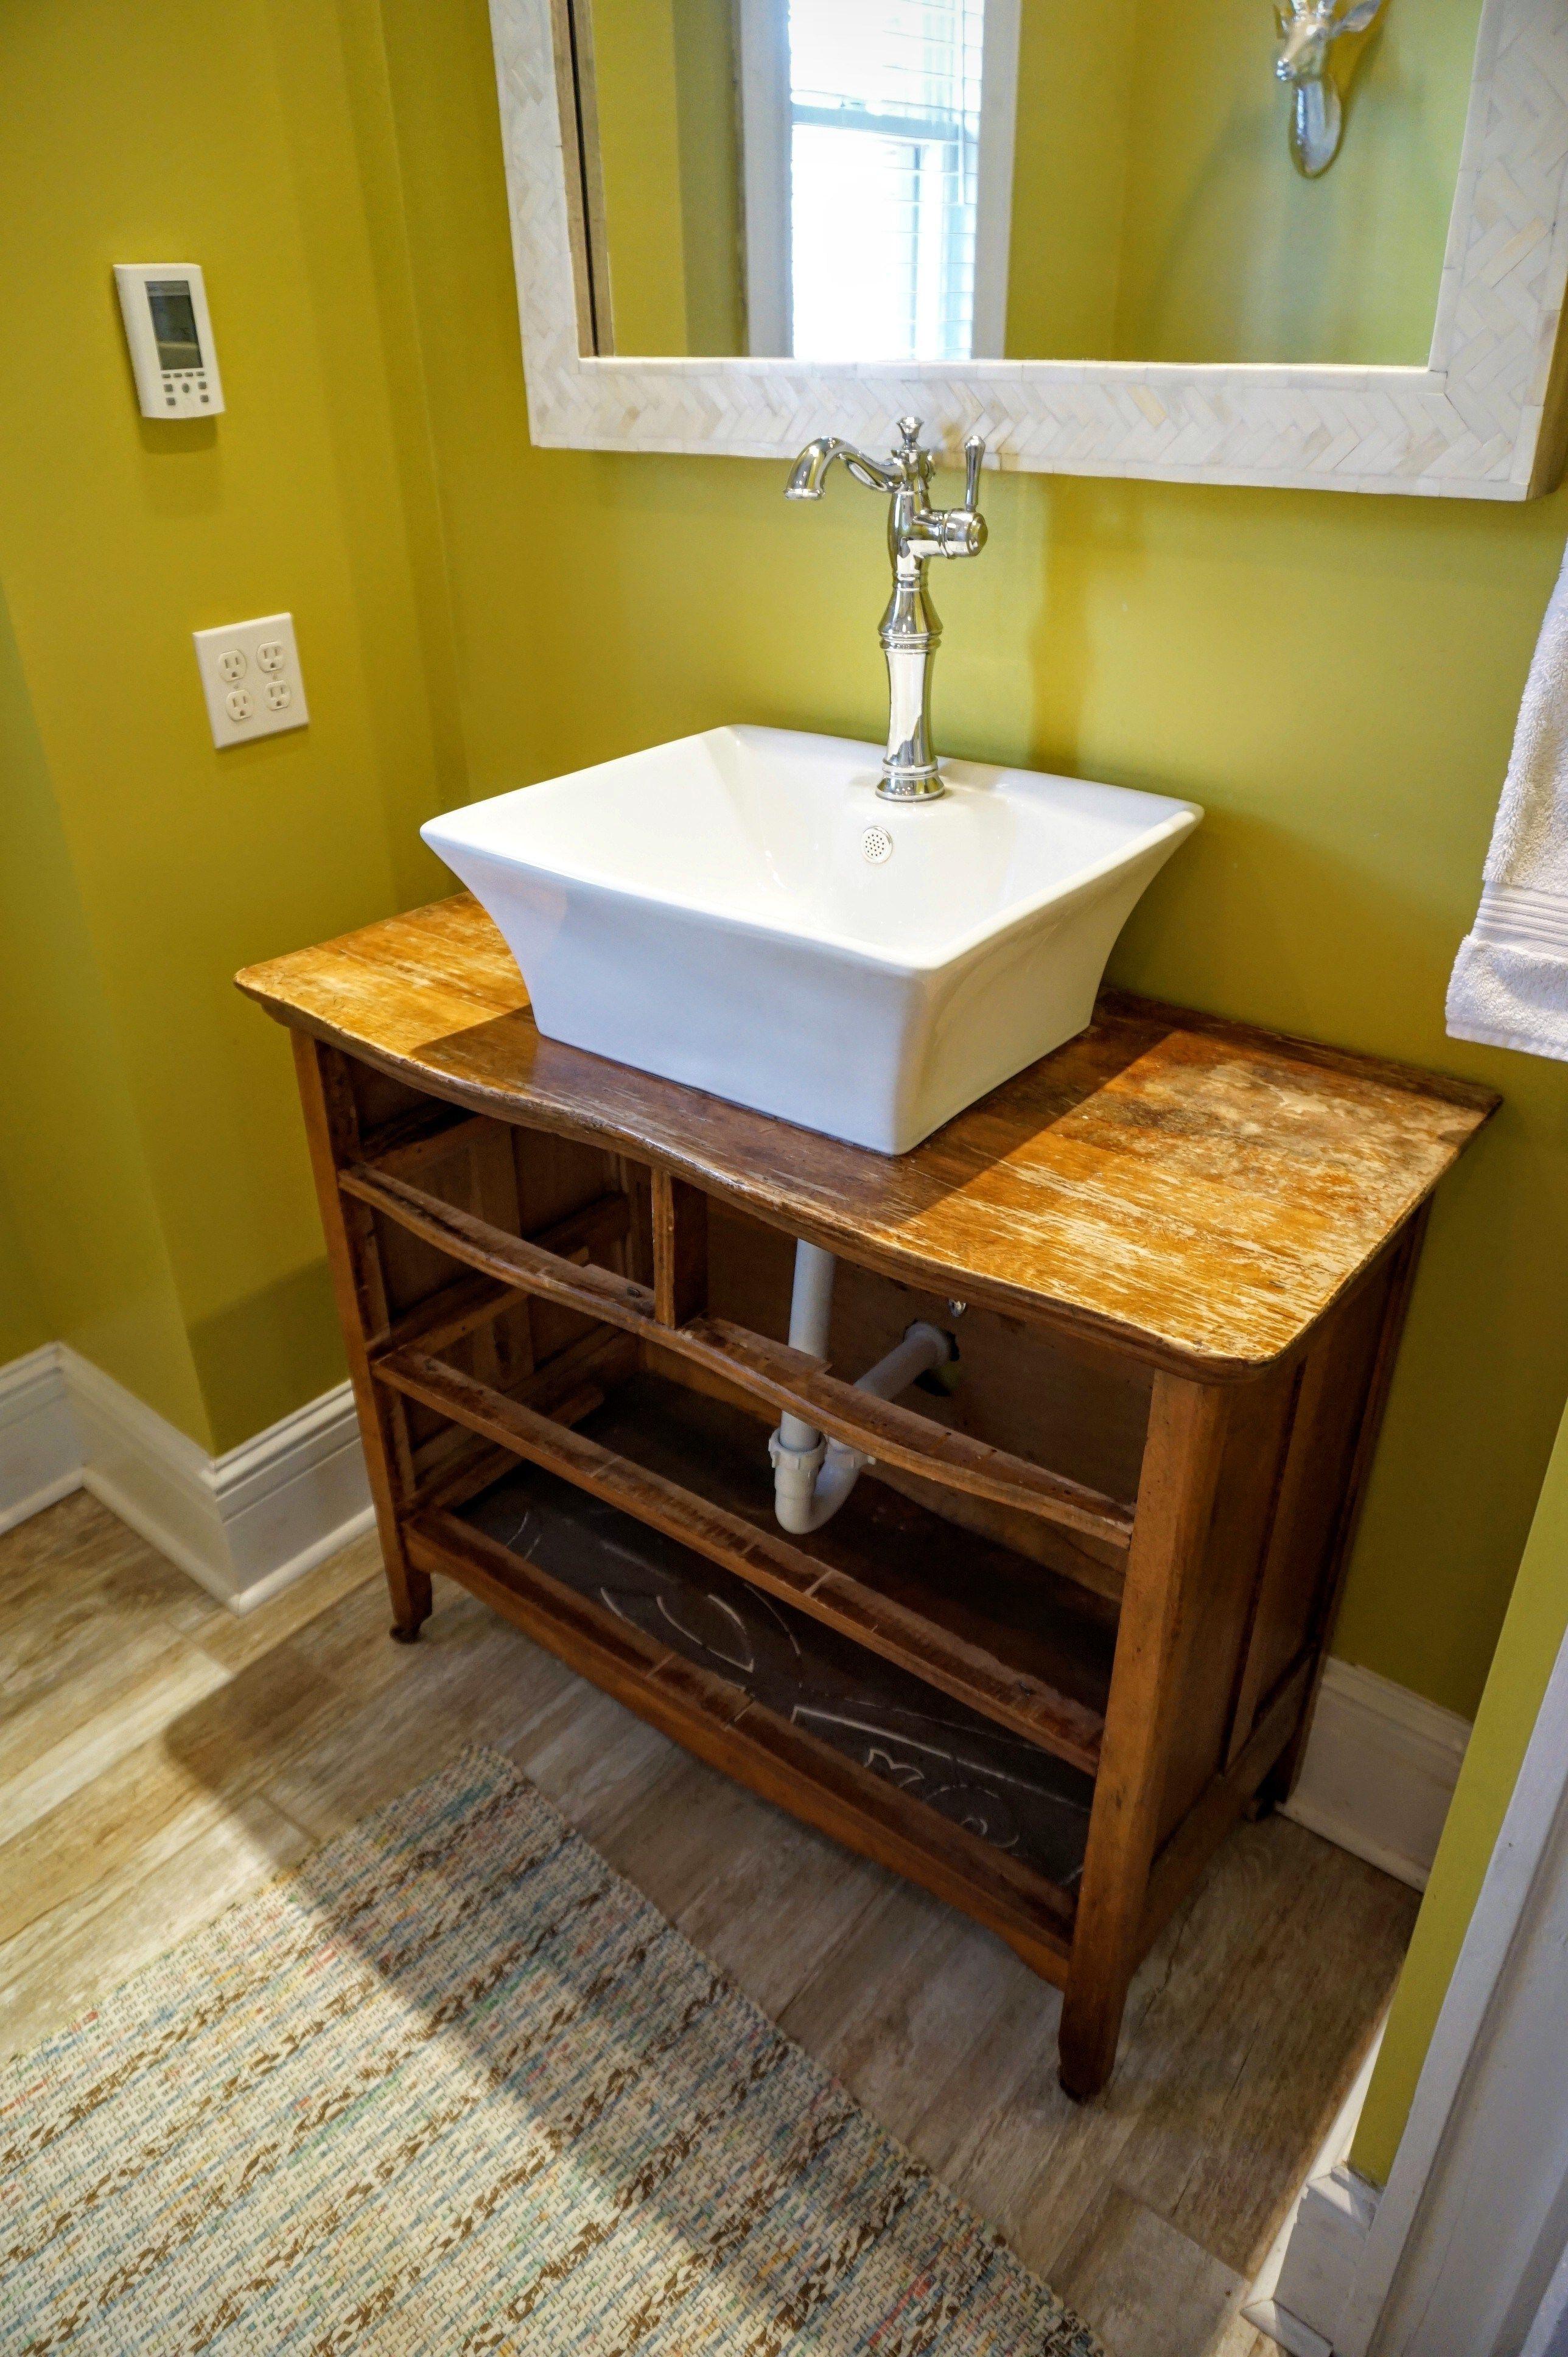 top bathroom vanity made from an old table is it possible on custom bathroom vanity plans id=55026